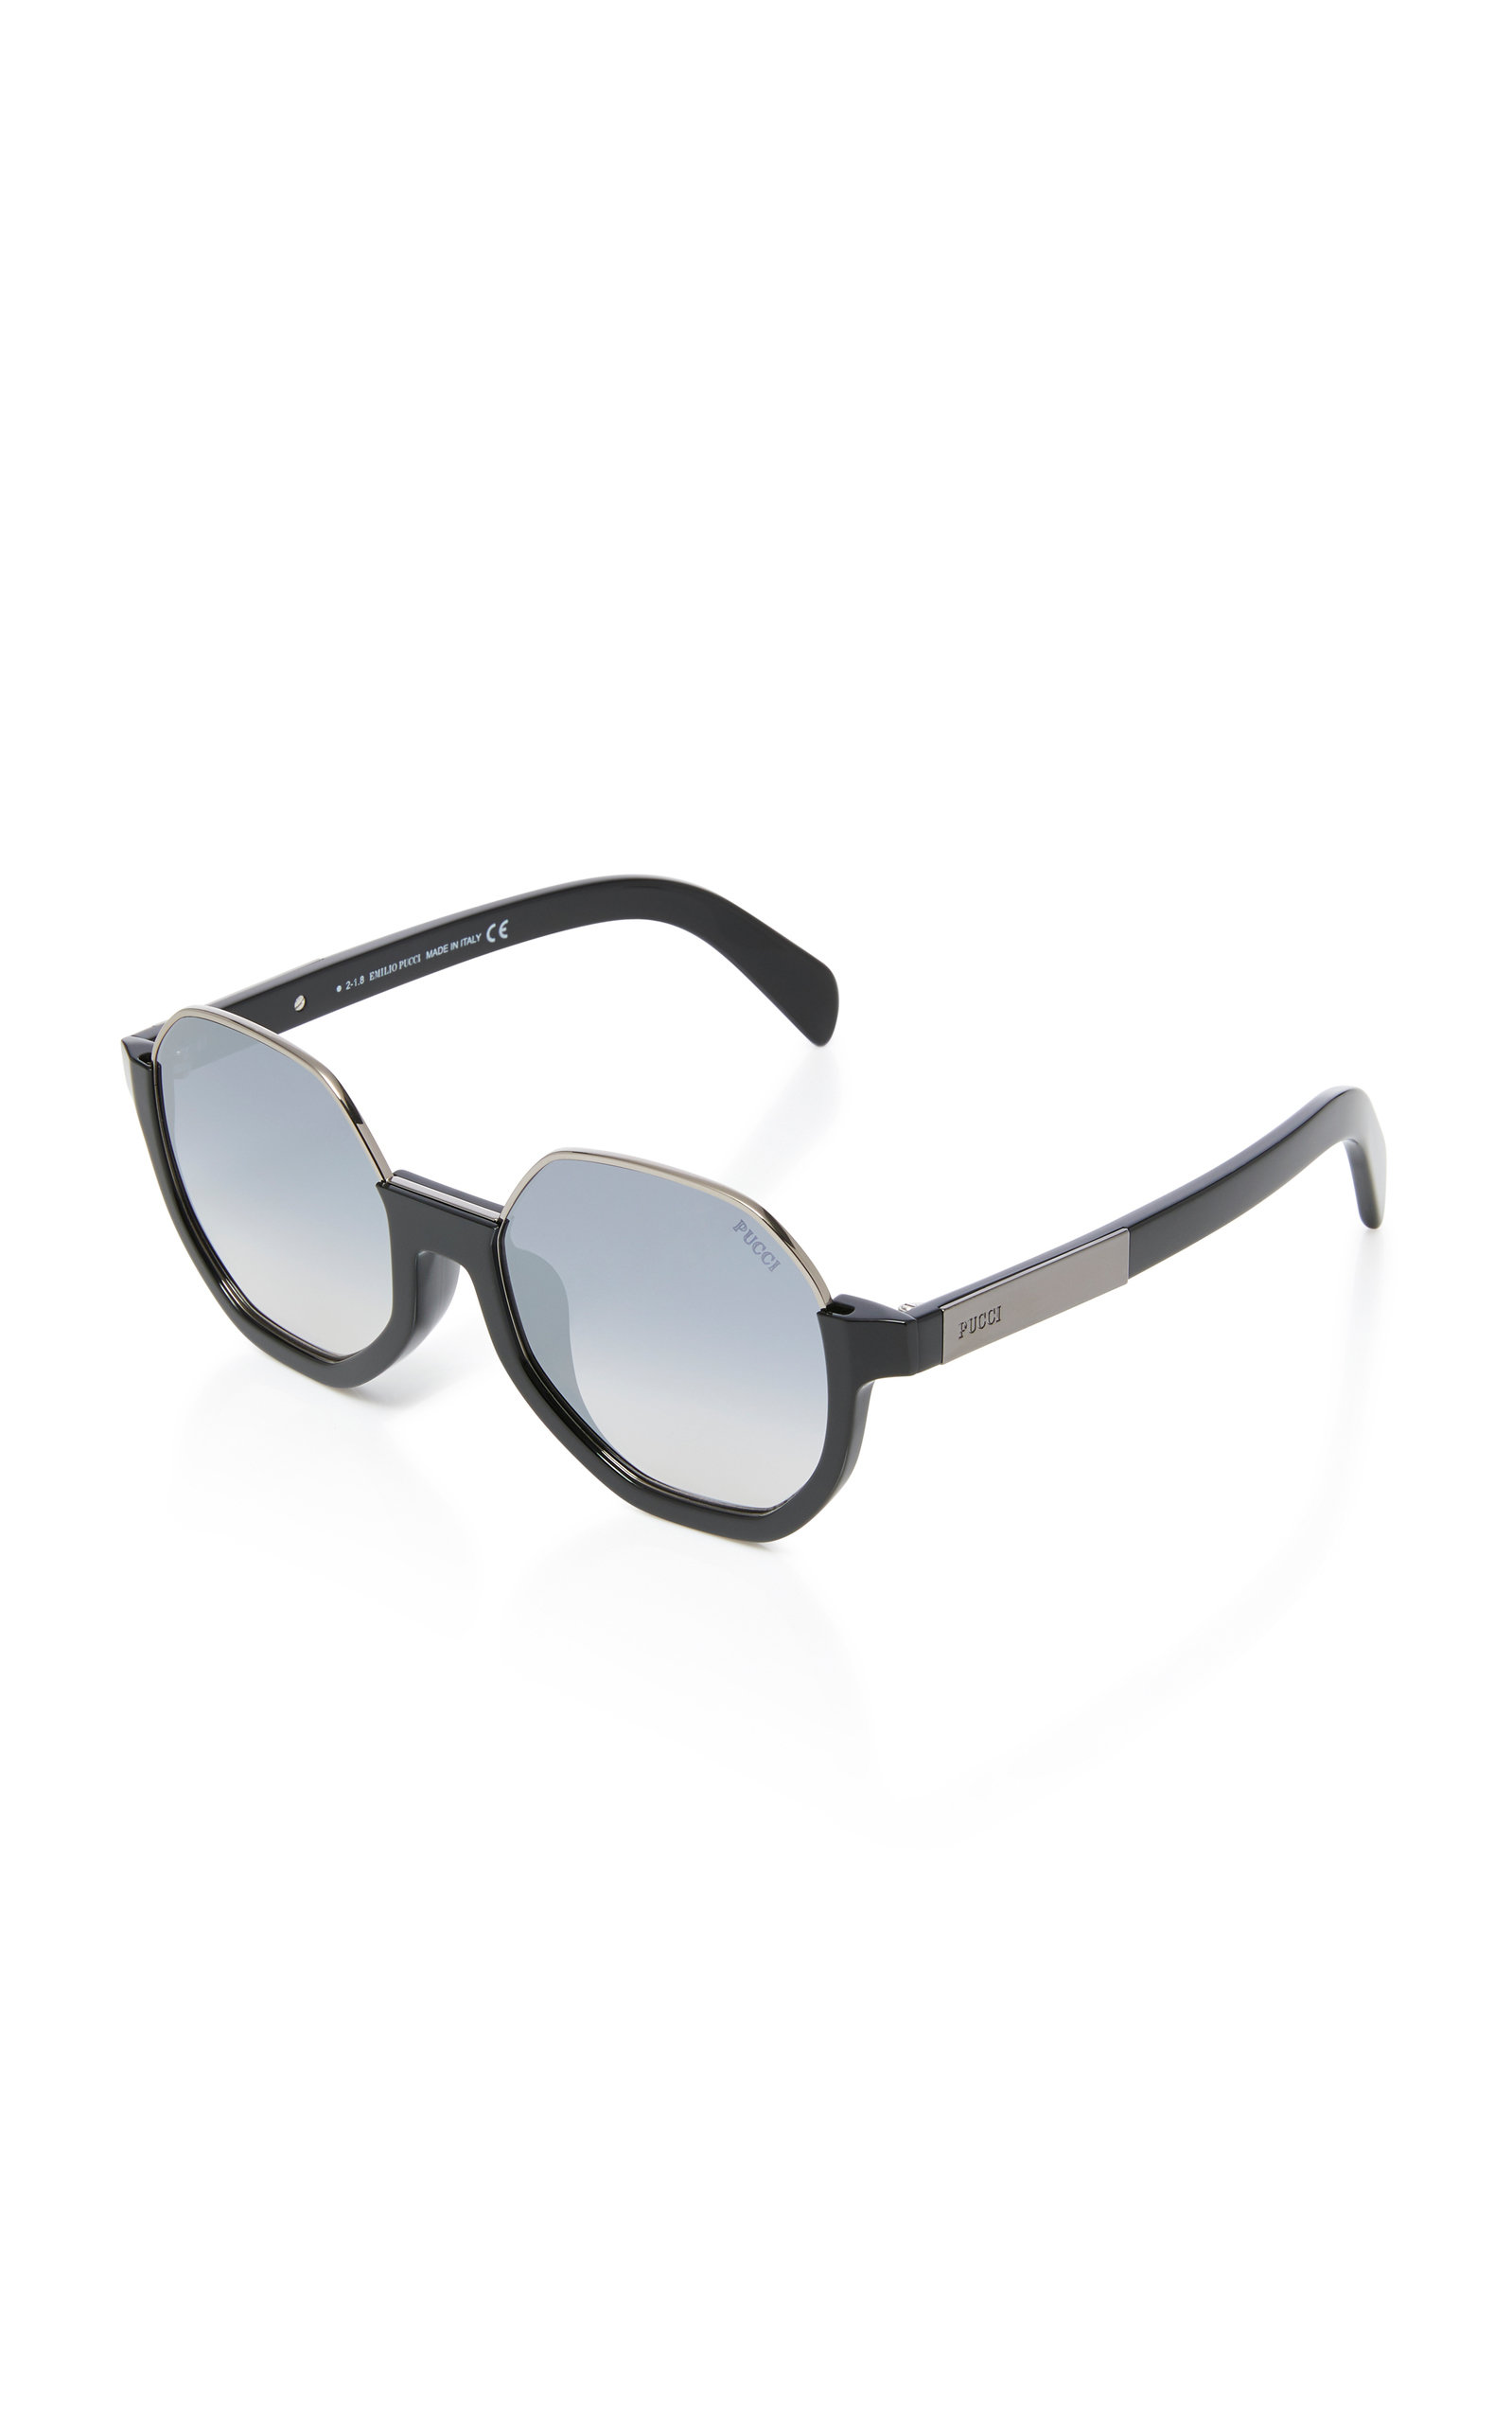 356f0bf9f7589 large emilio-pucci-sunglasses-pink-contrast-frame-round-acetate-sunglasses .jpg